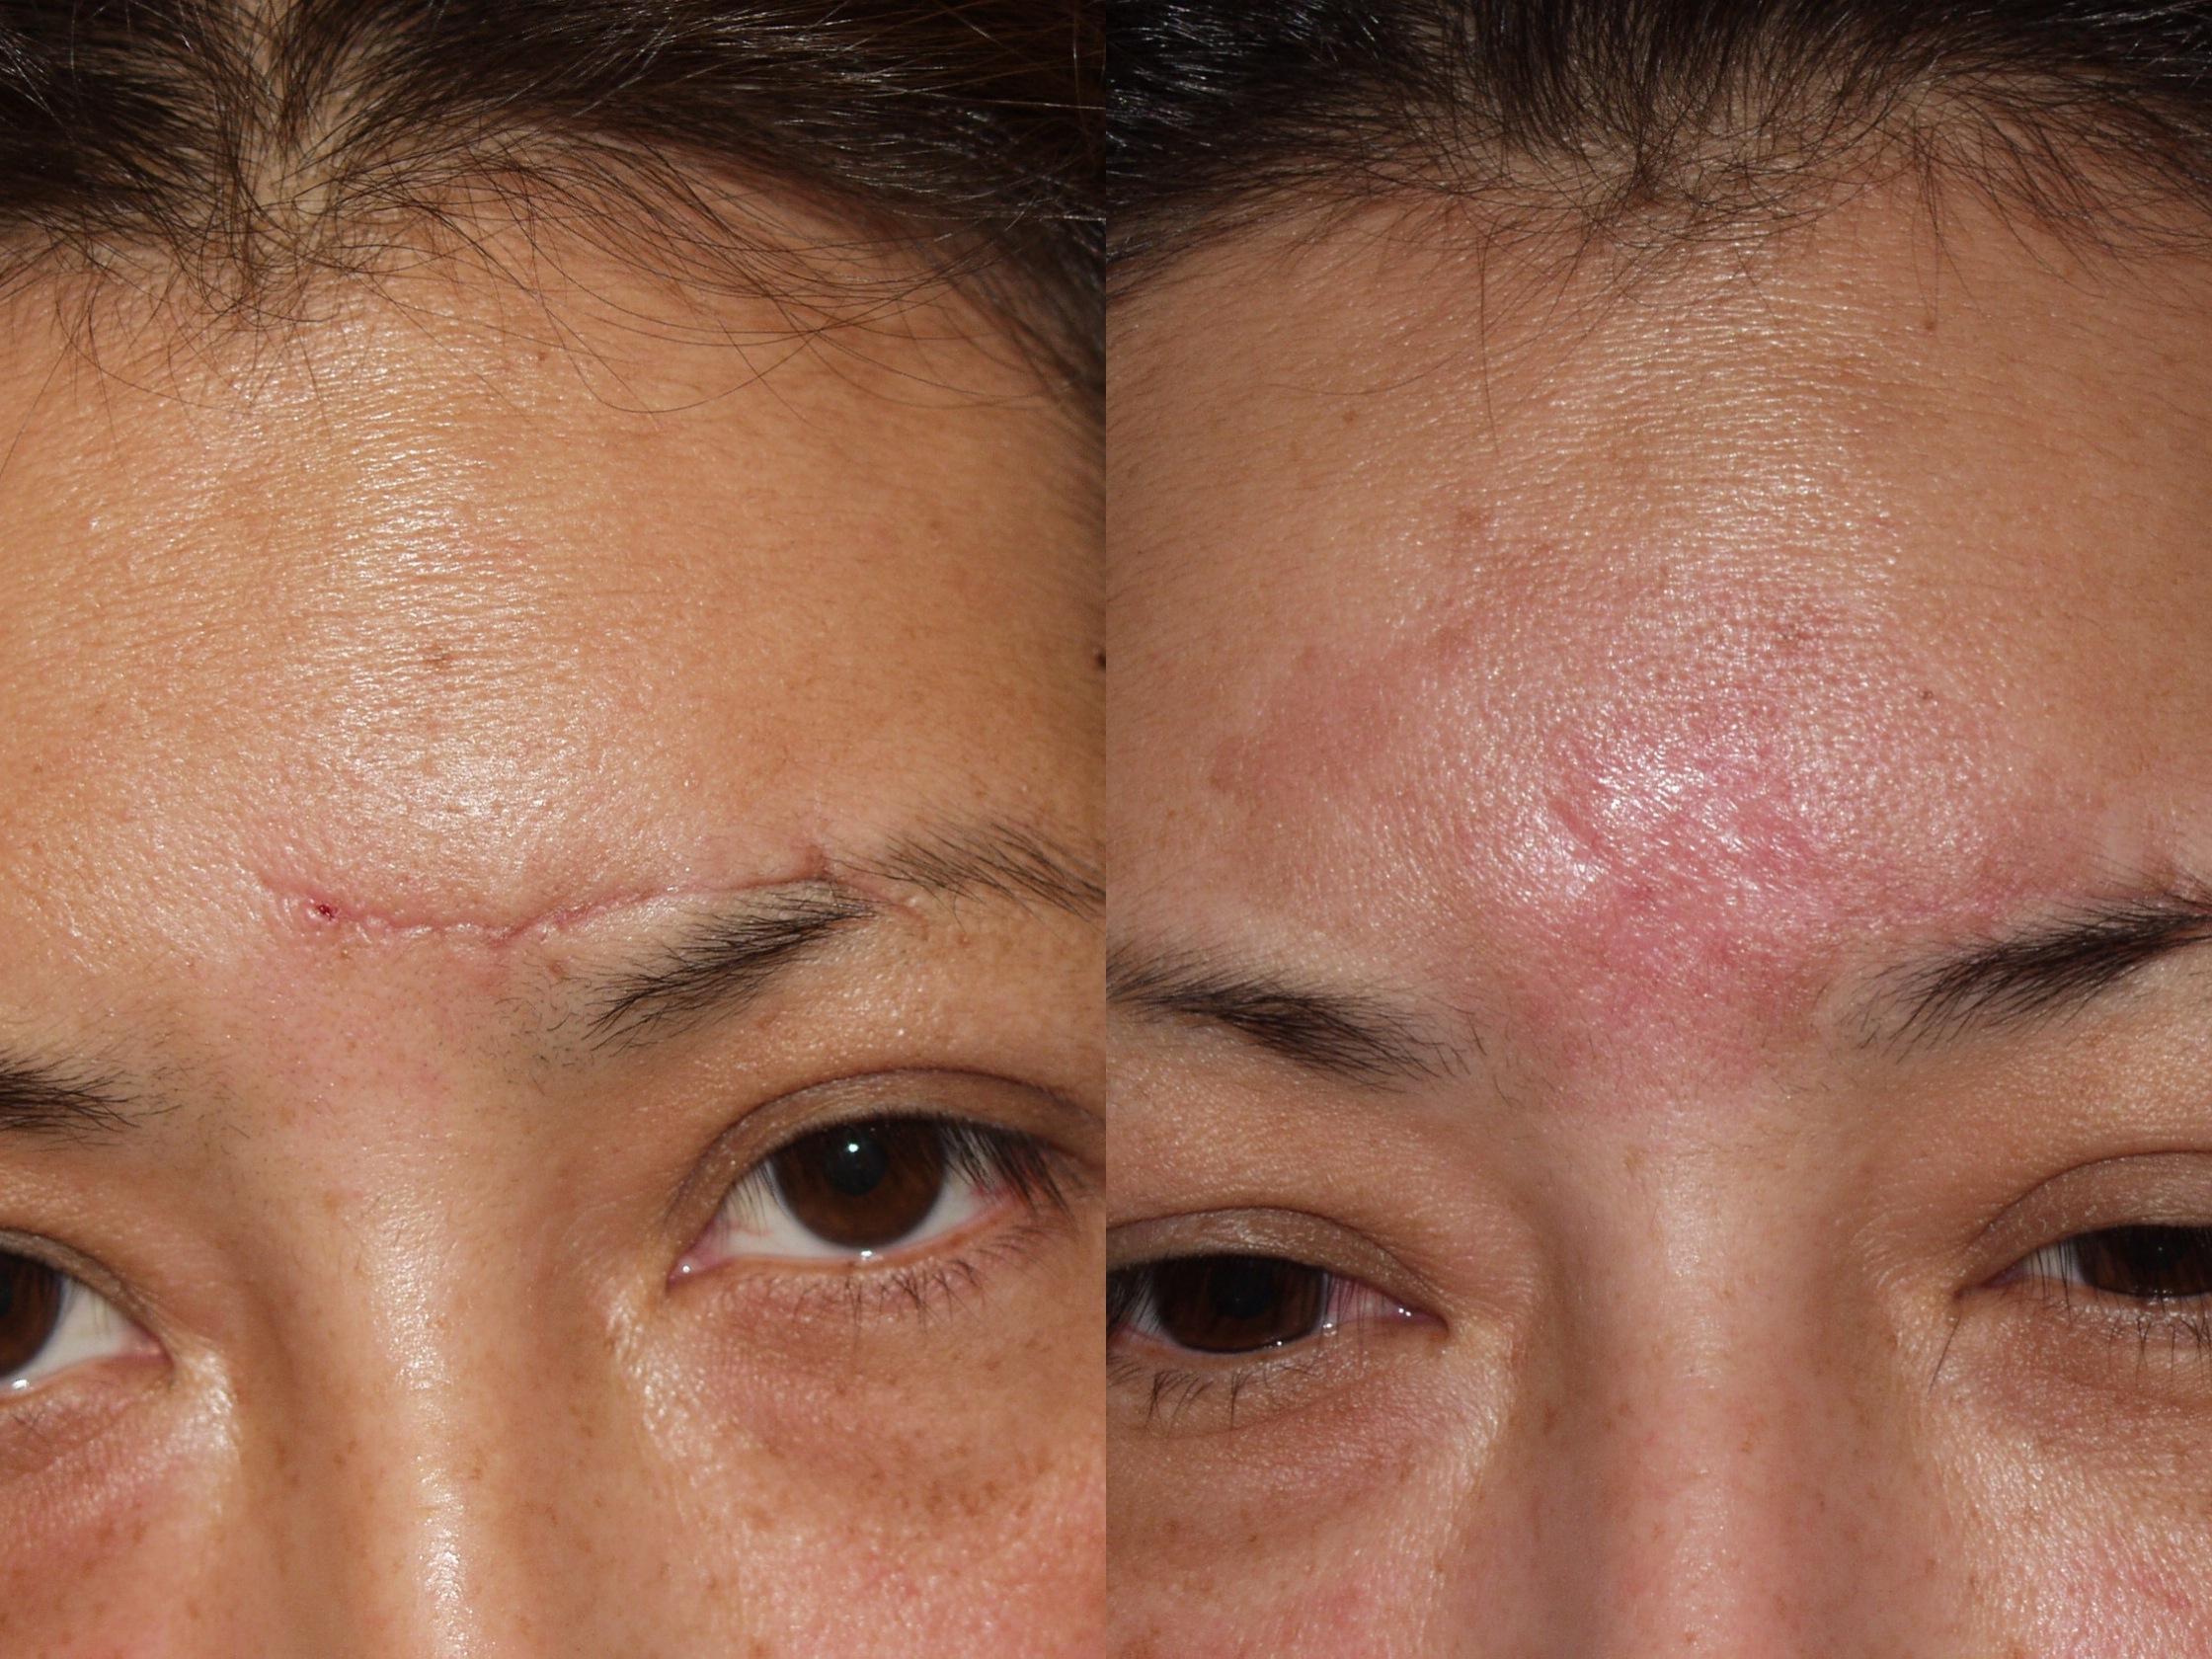 Facial scar revisions